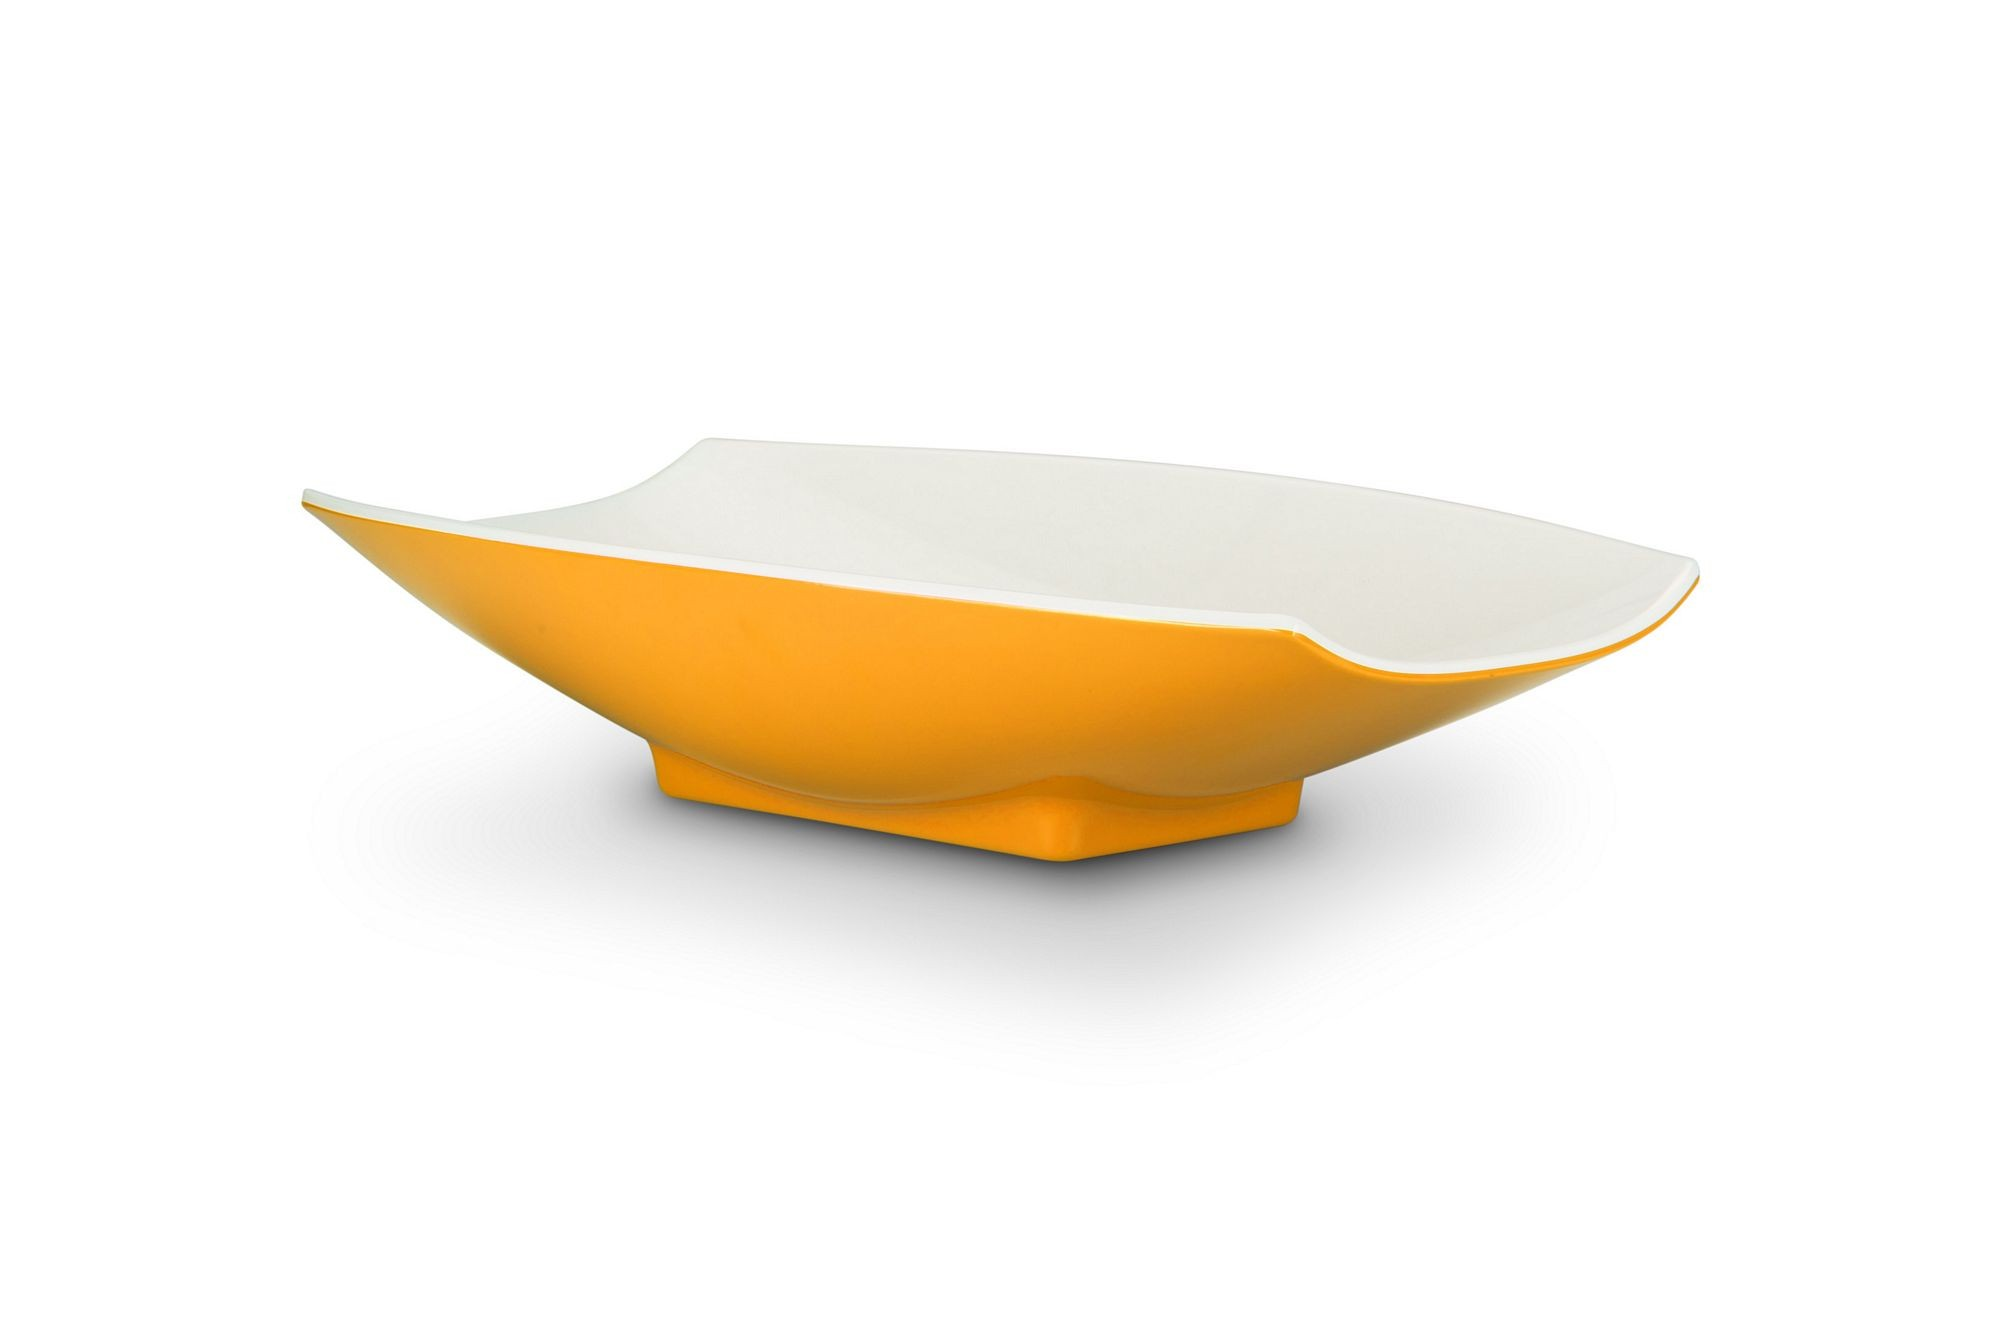 Bon Chef 53704-2ToneYellow Melamine Curves Bowl, Yellow Outside/White Inside 2 Qt.